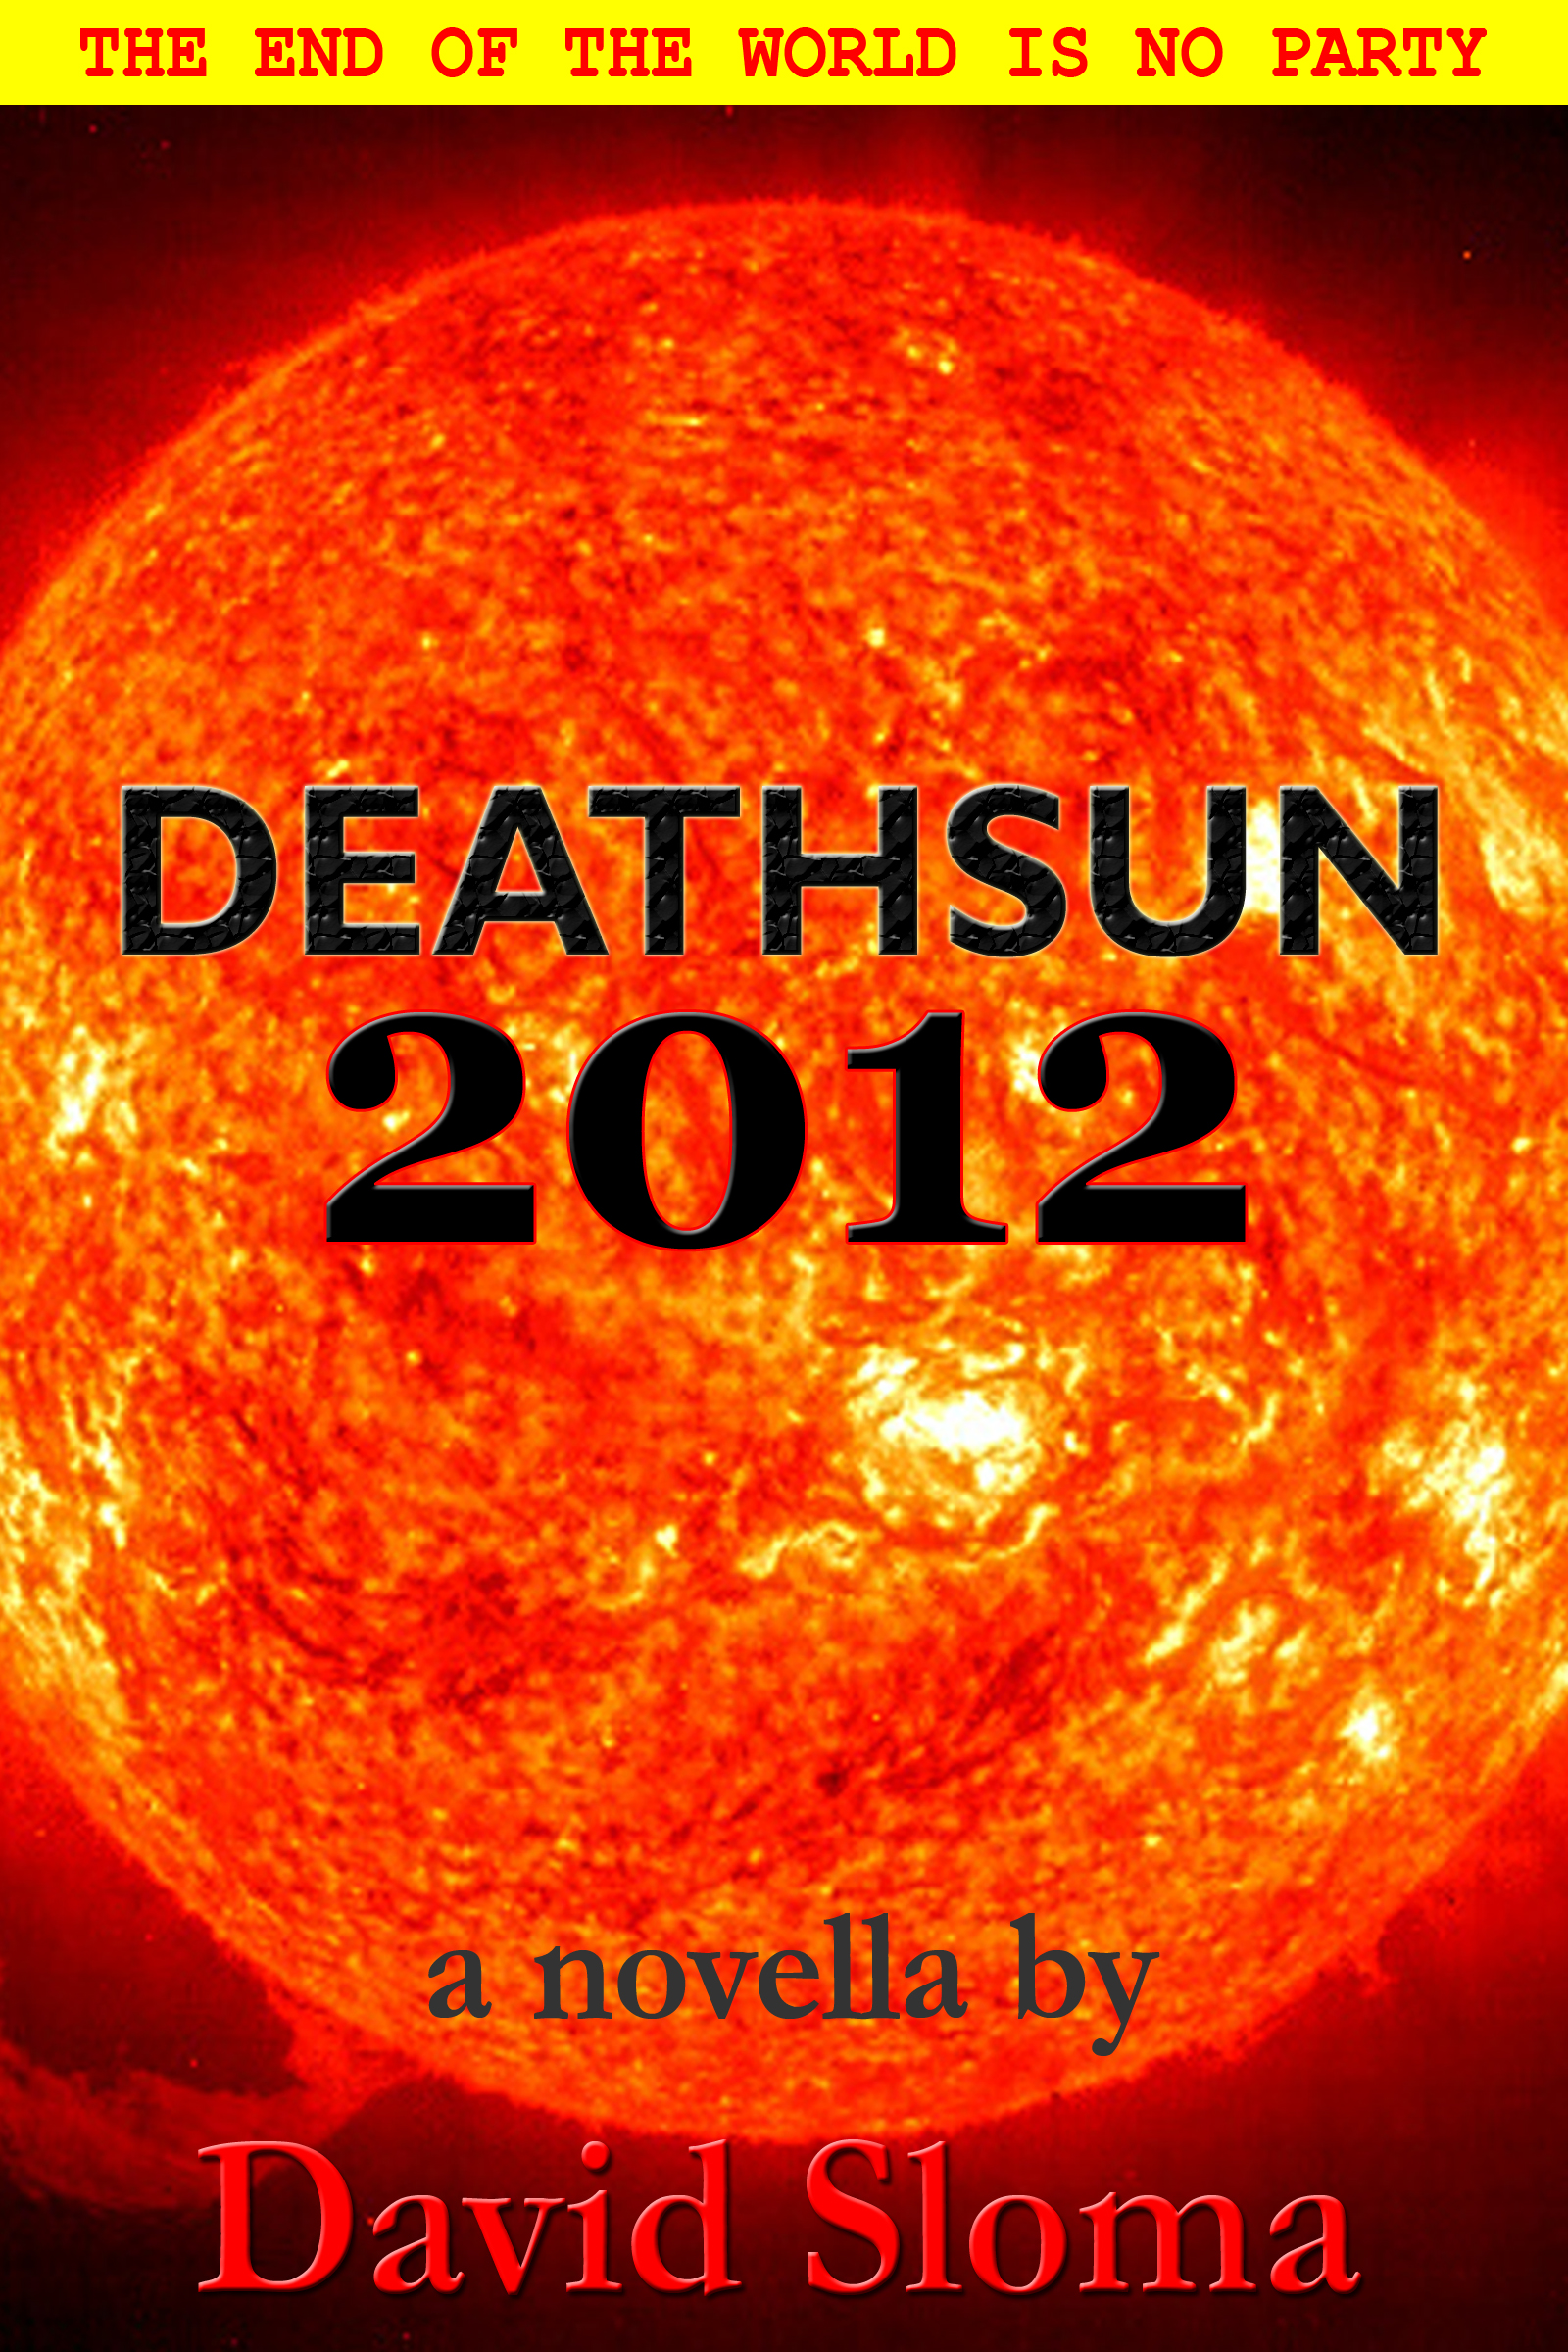 Deathsun 2012 – novella